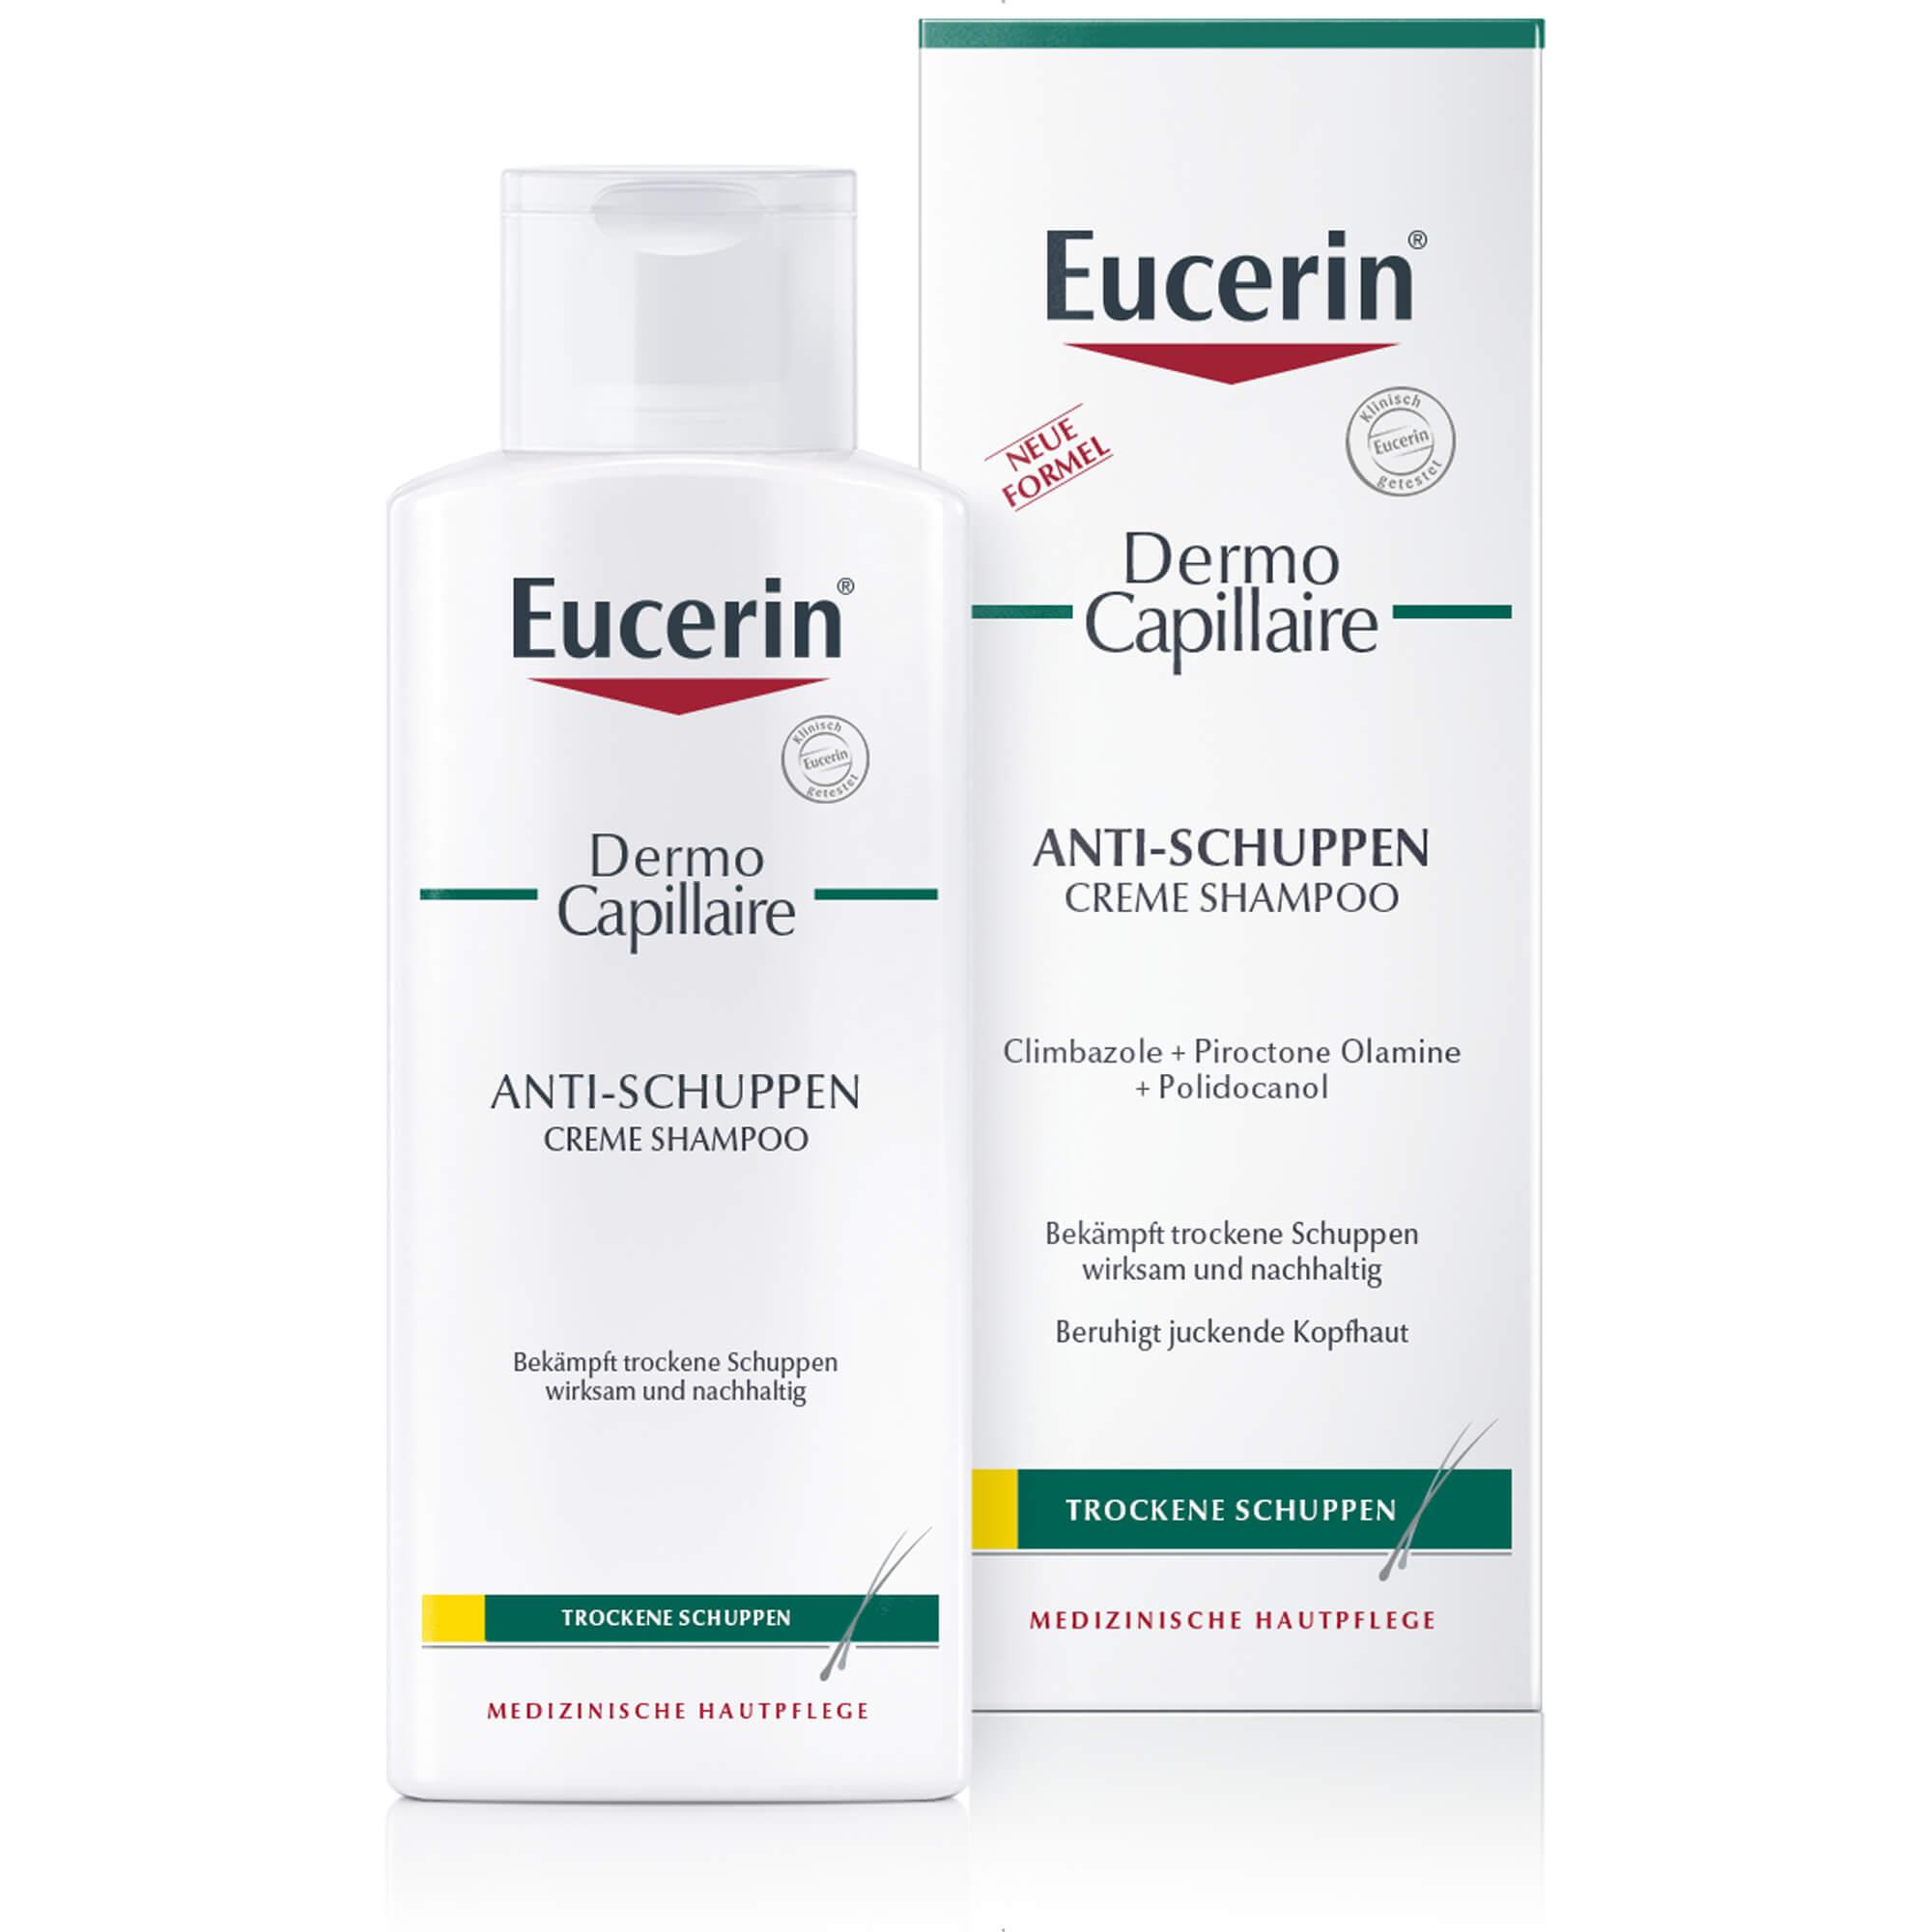 EUCERIN-DermoCapillaire-Anti-Schuppen-Creme-Shamp